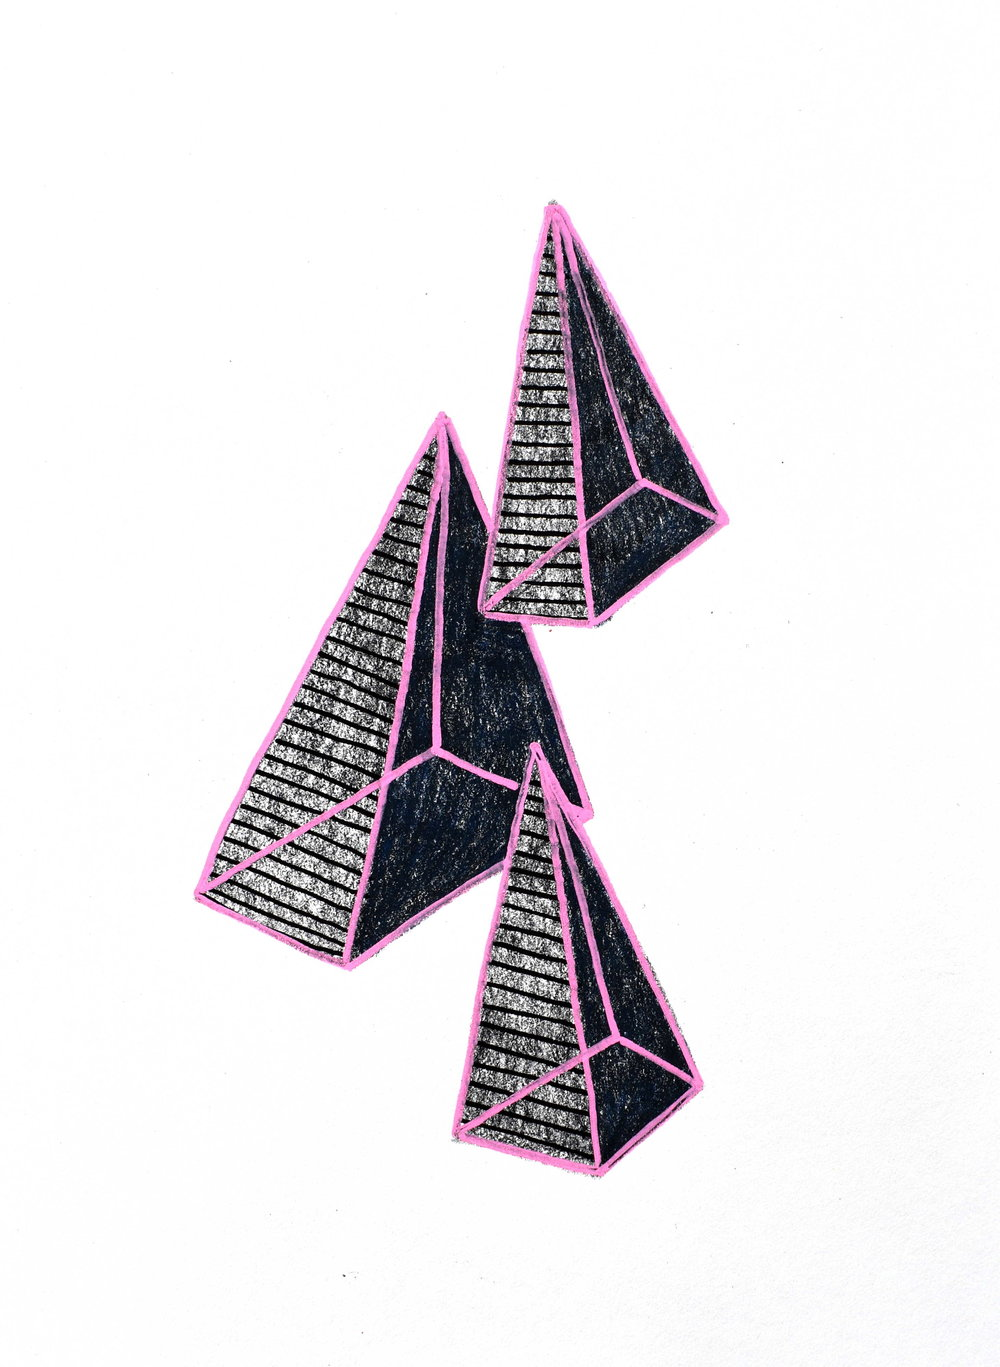 Dark Pyramids